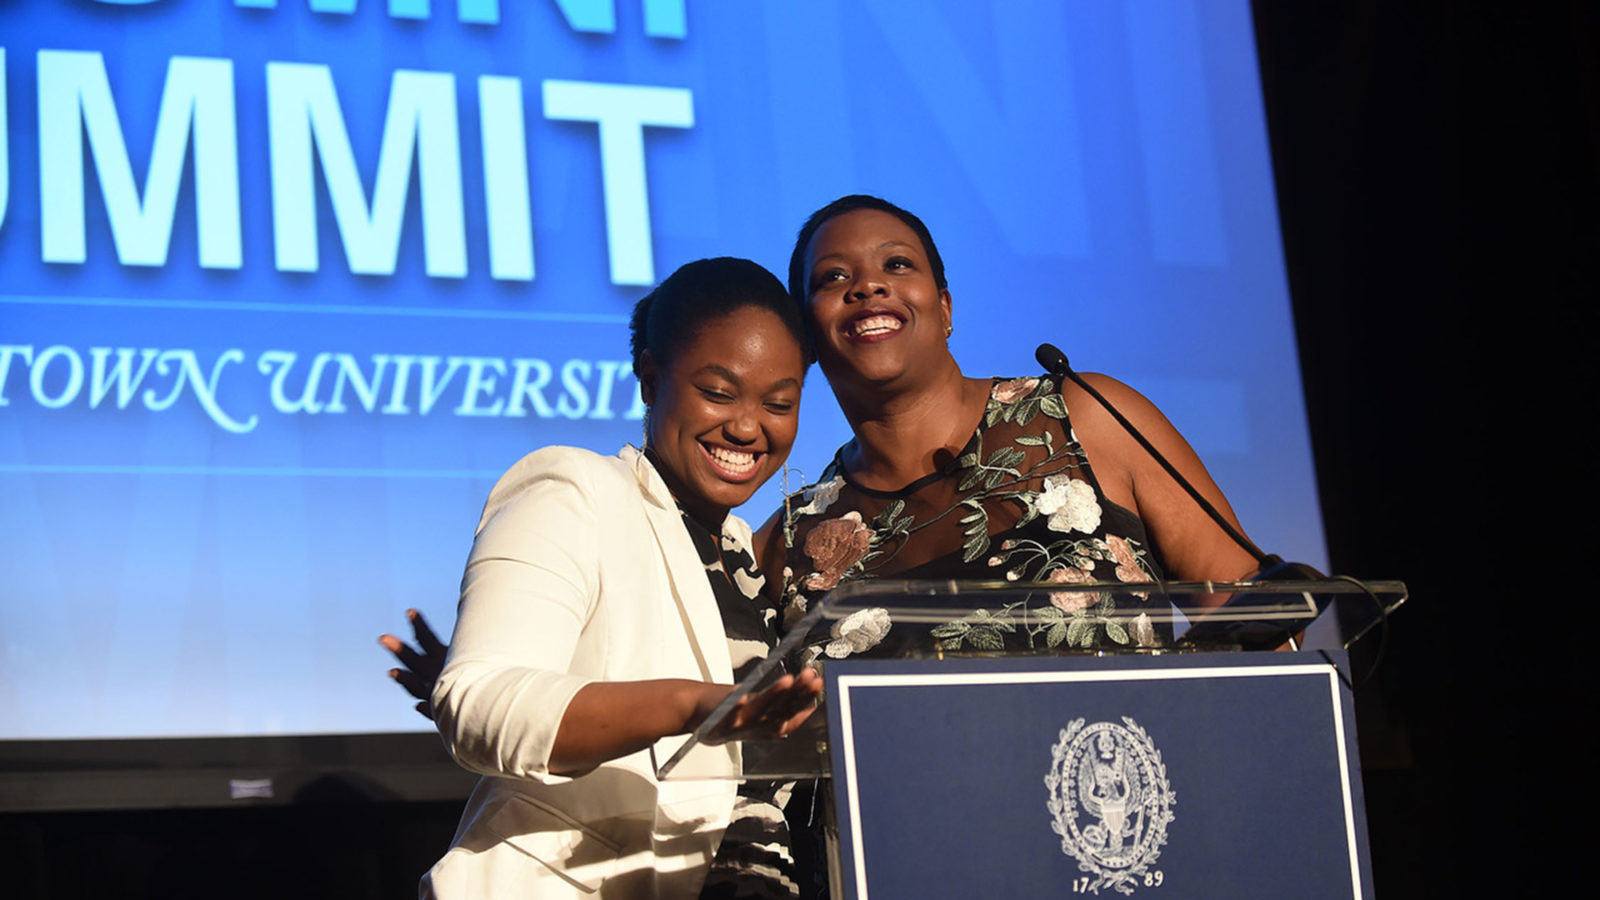 Elizabeth Nalunga and Kaya Henderson embrace at the lectern on stage with Black Alumni Summit signage on a blue background.